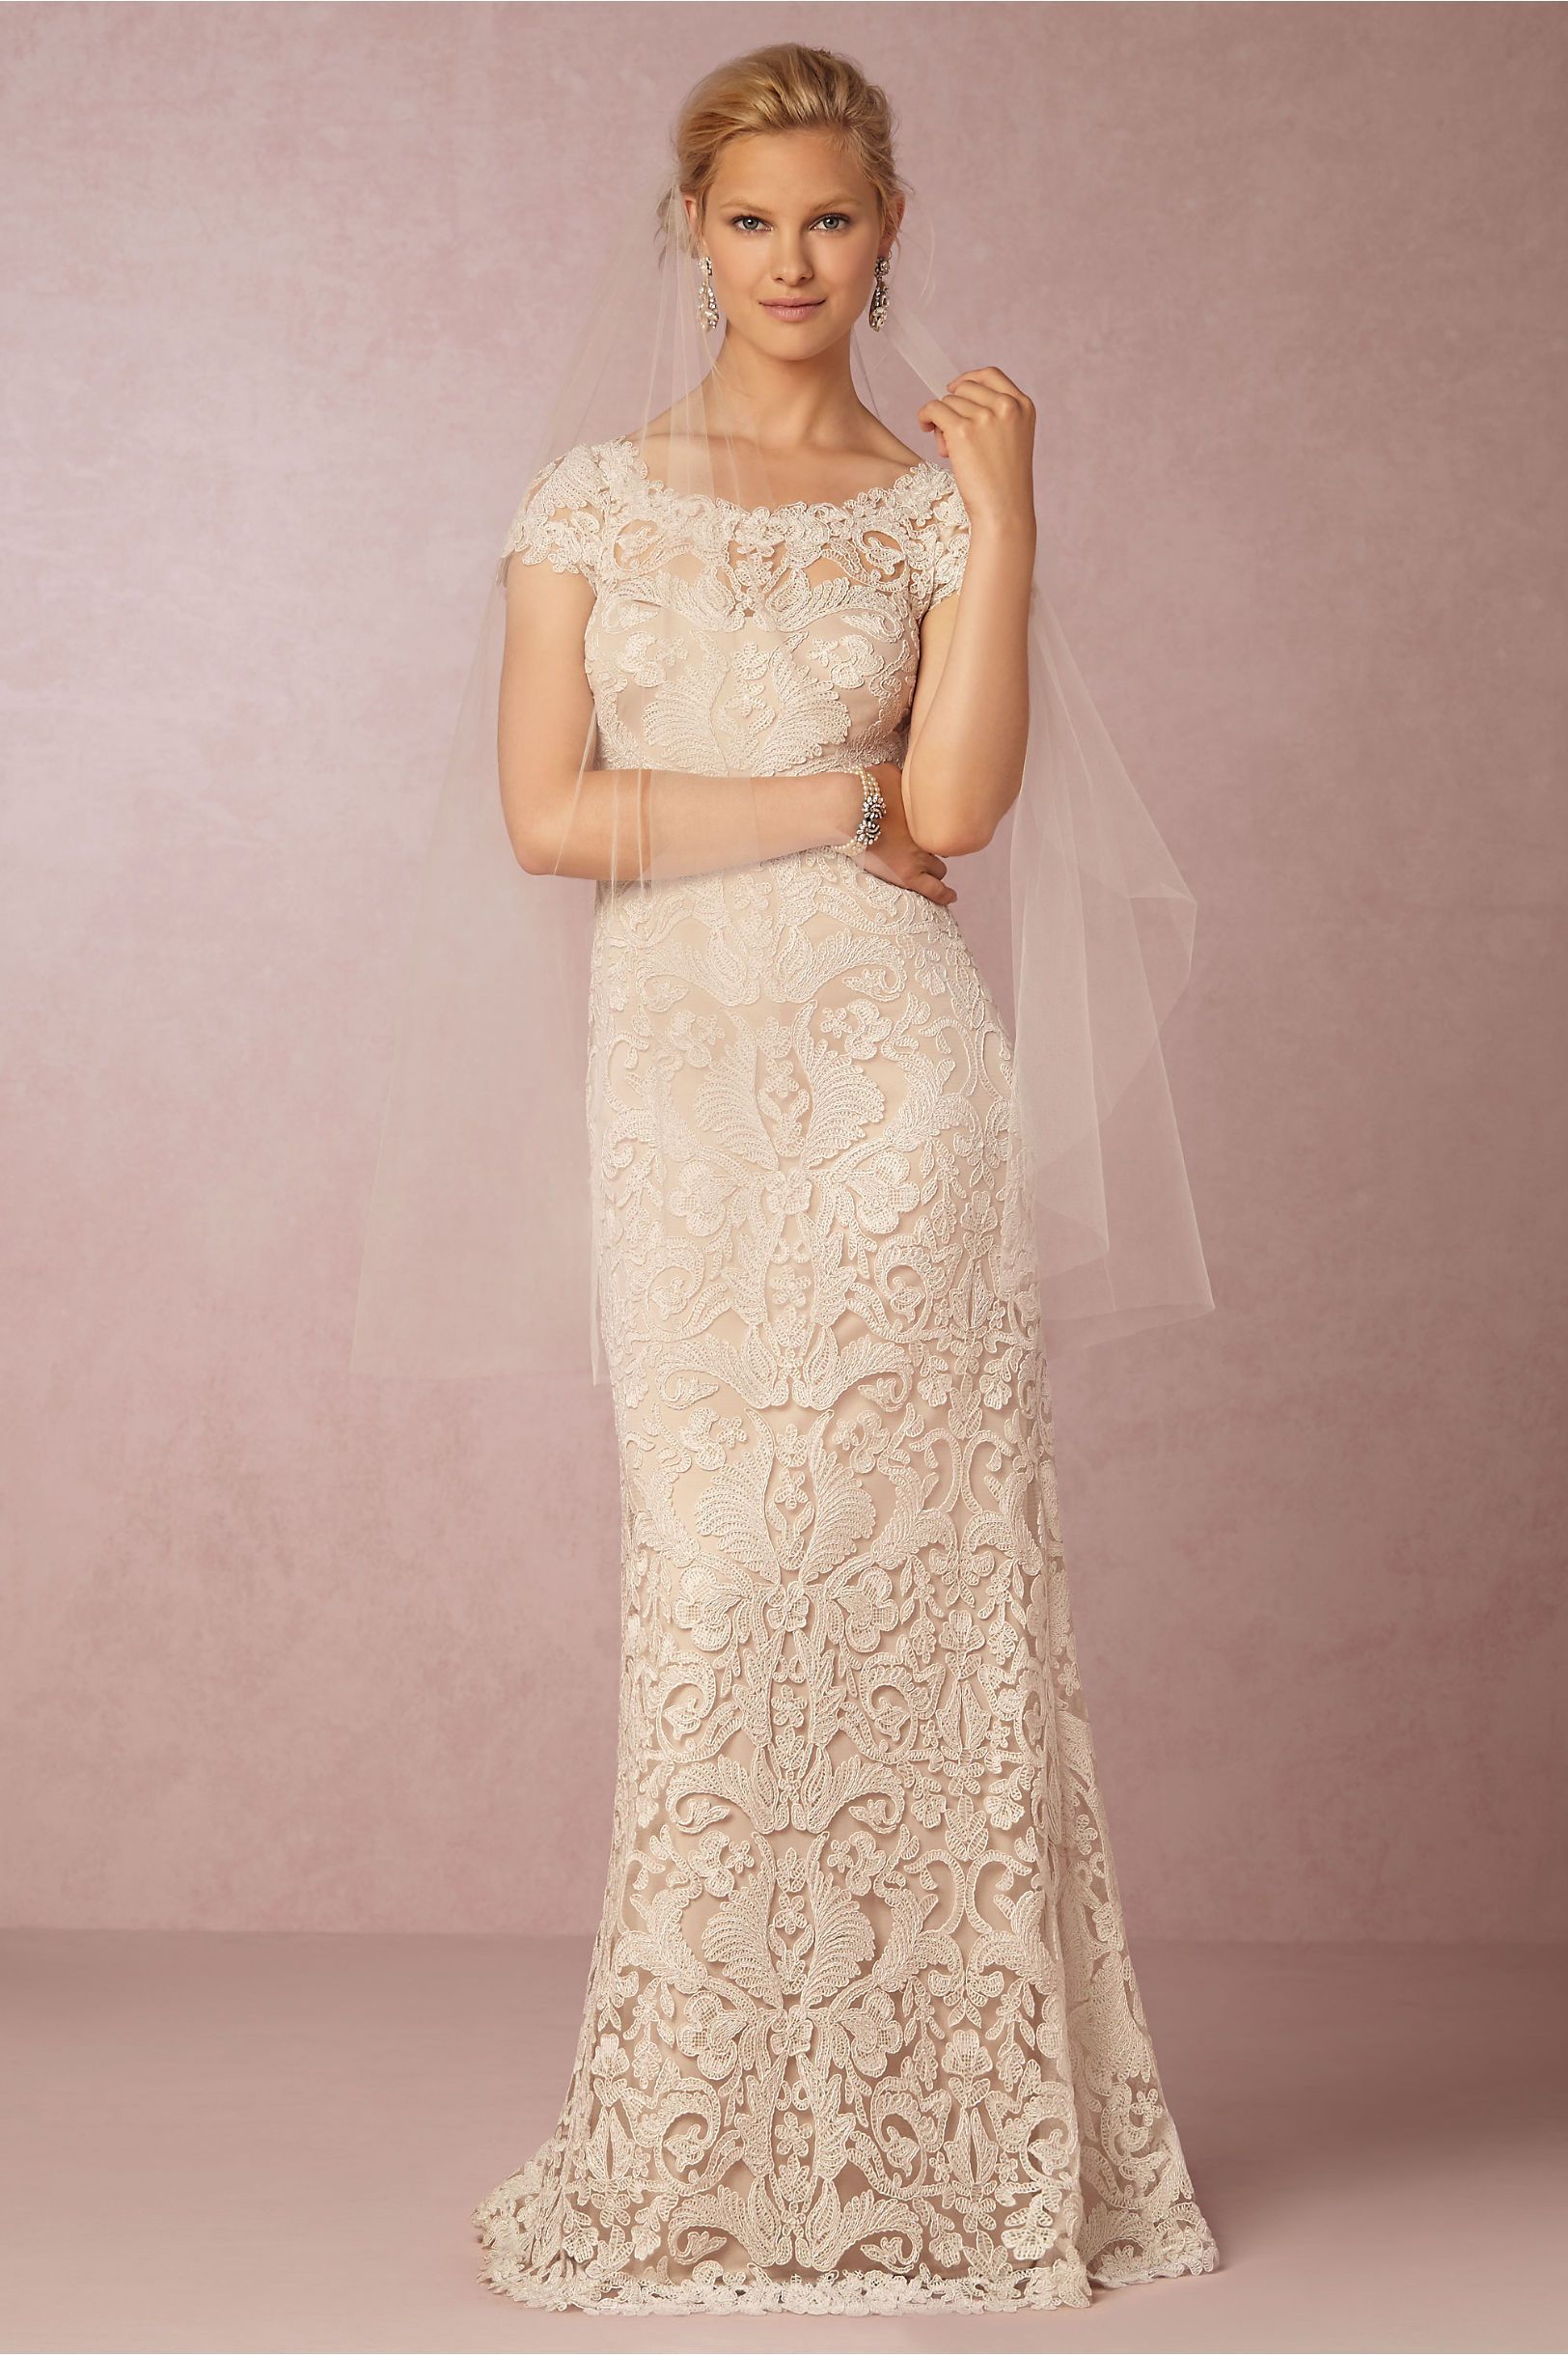 August Gown By Tadashi Shoji Thumb 1